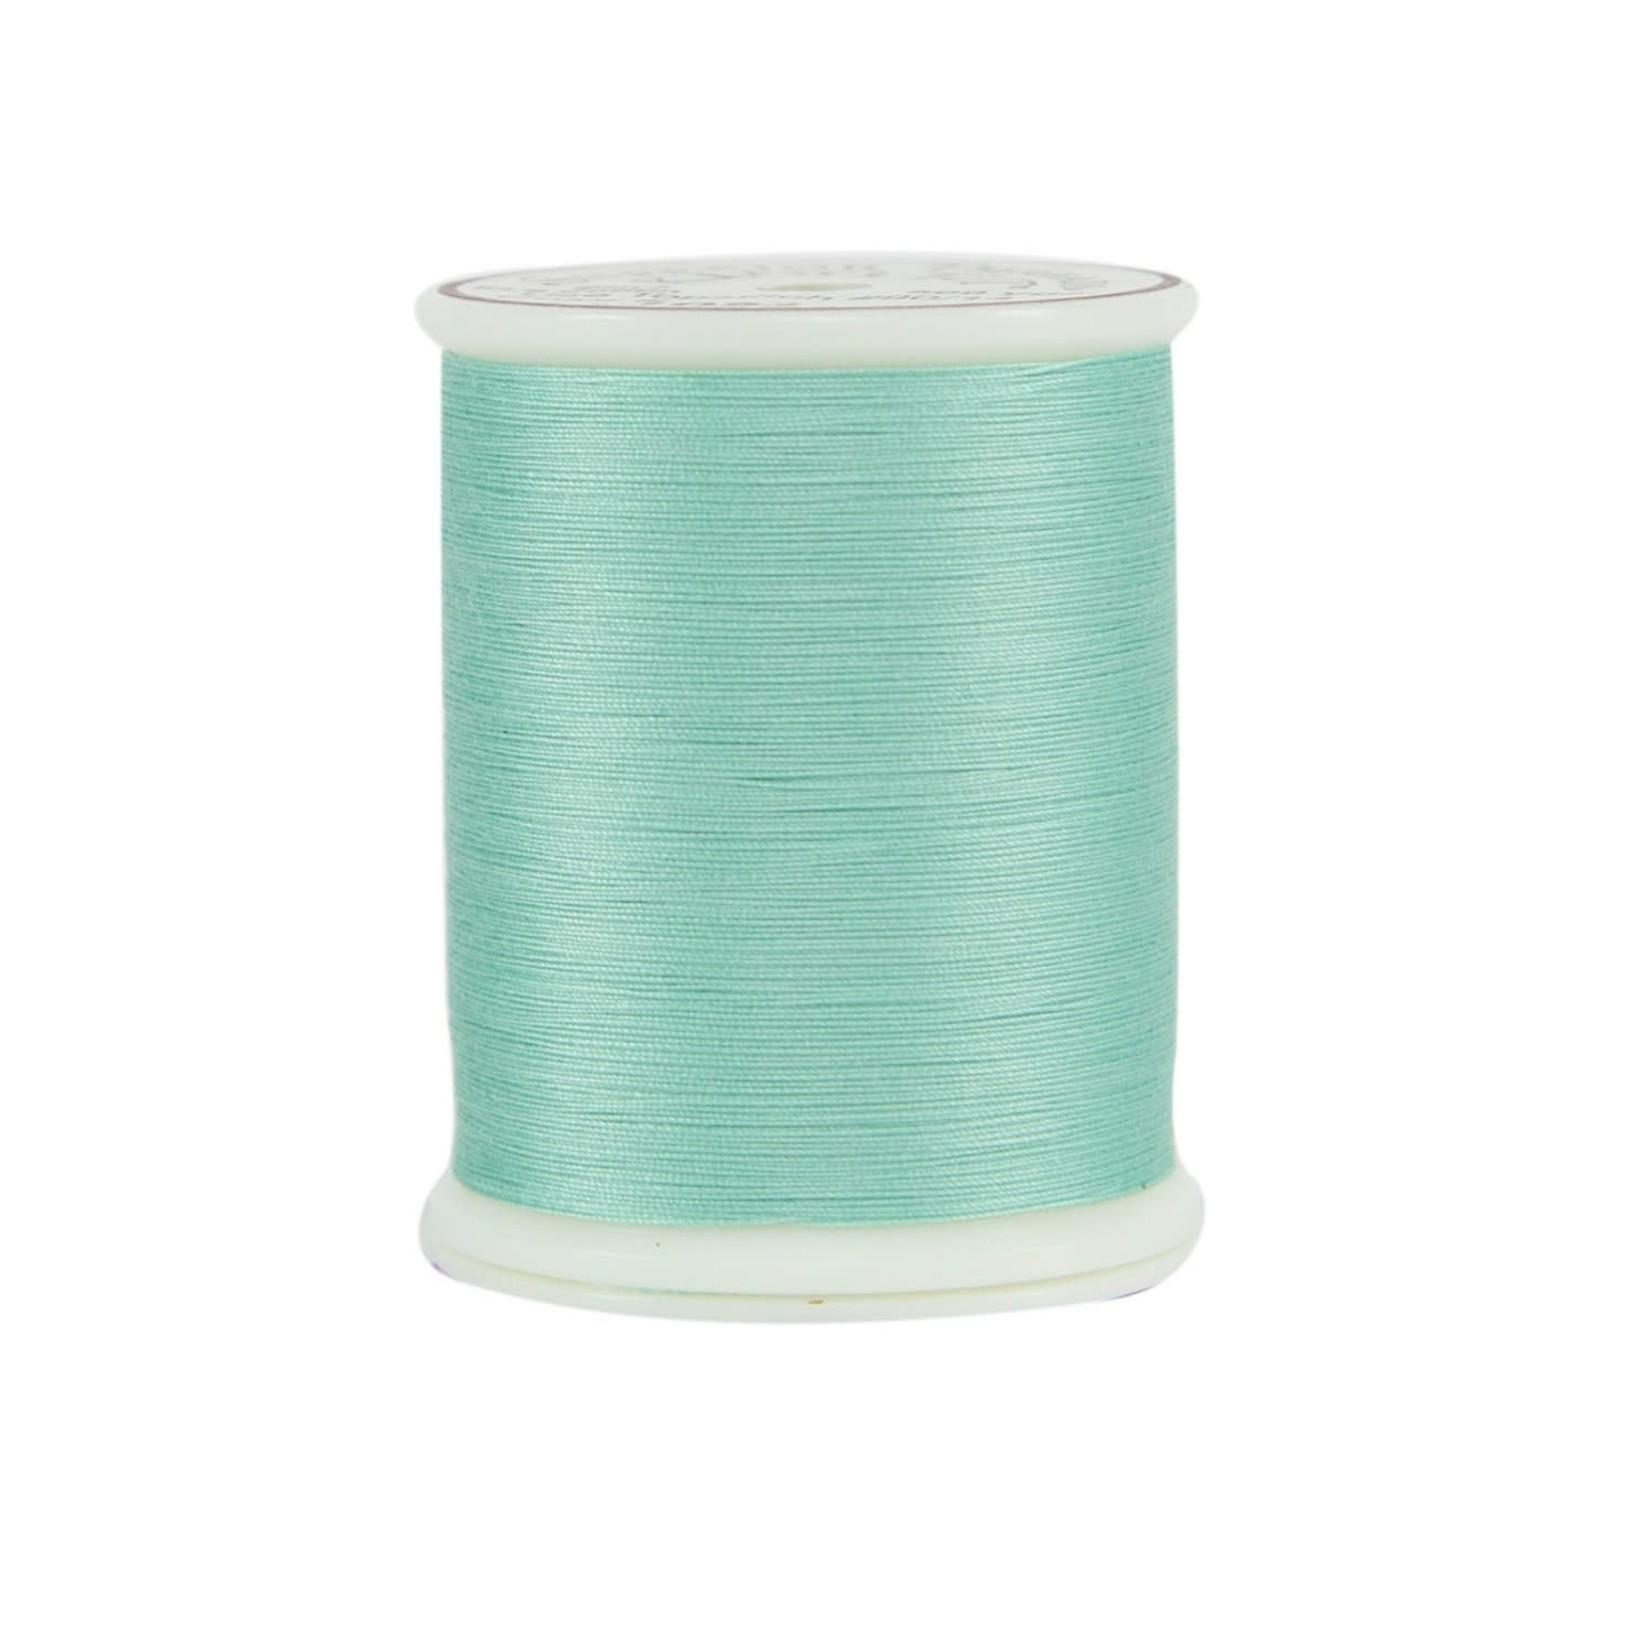 Superior Threads King Tut - #40 - 457 m - 1023 Mint Julep